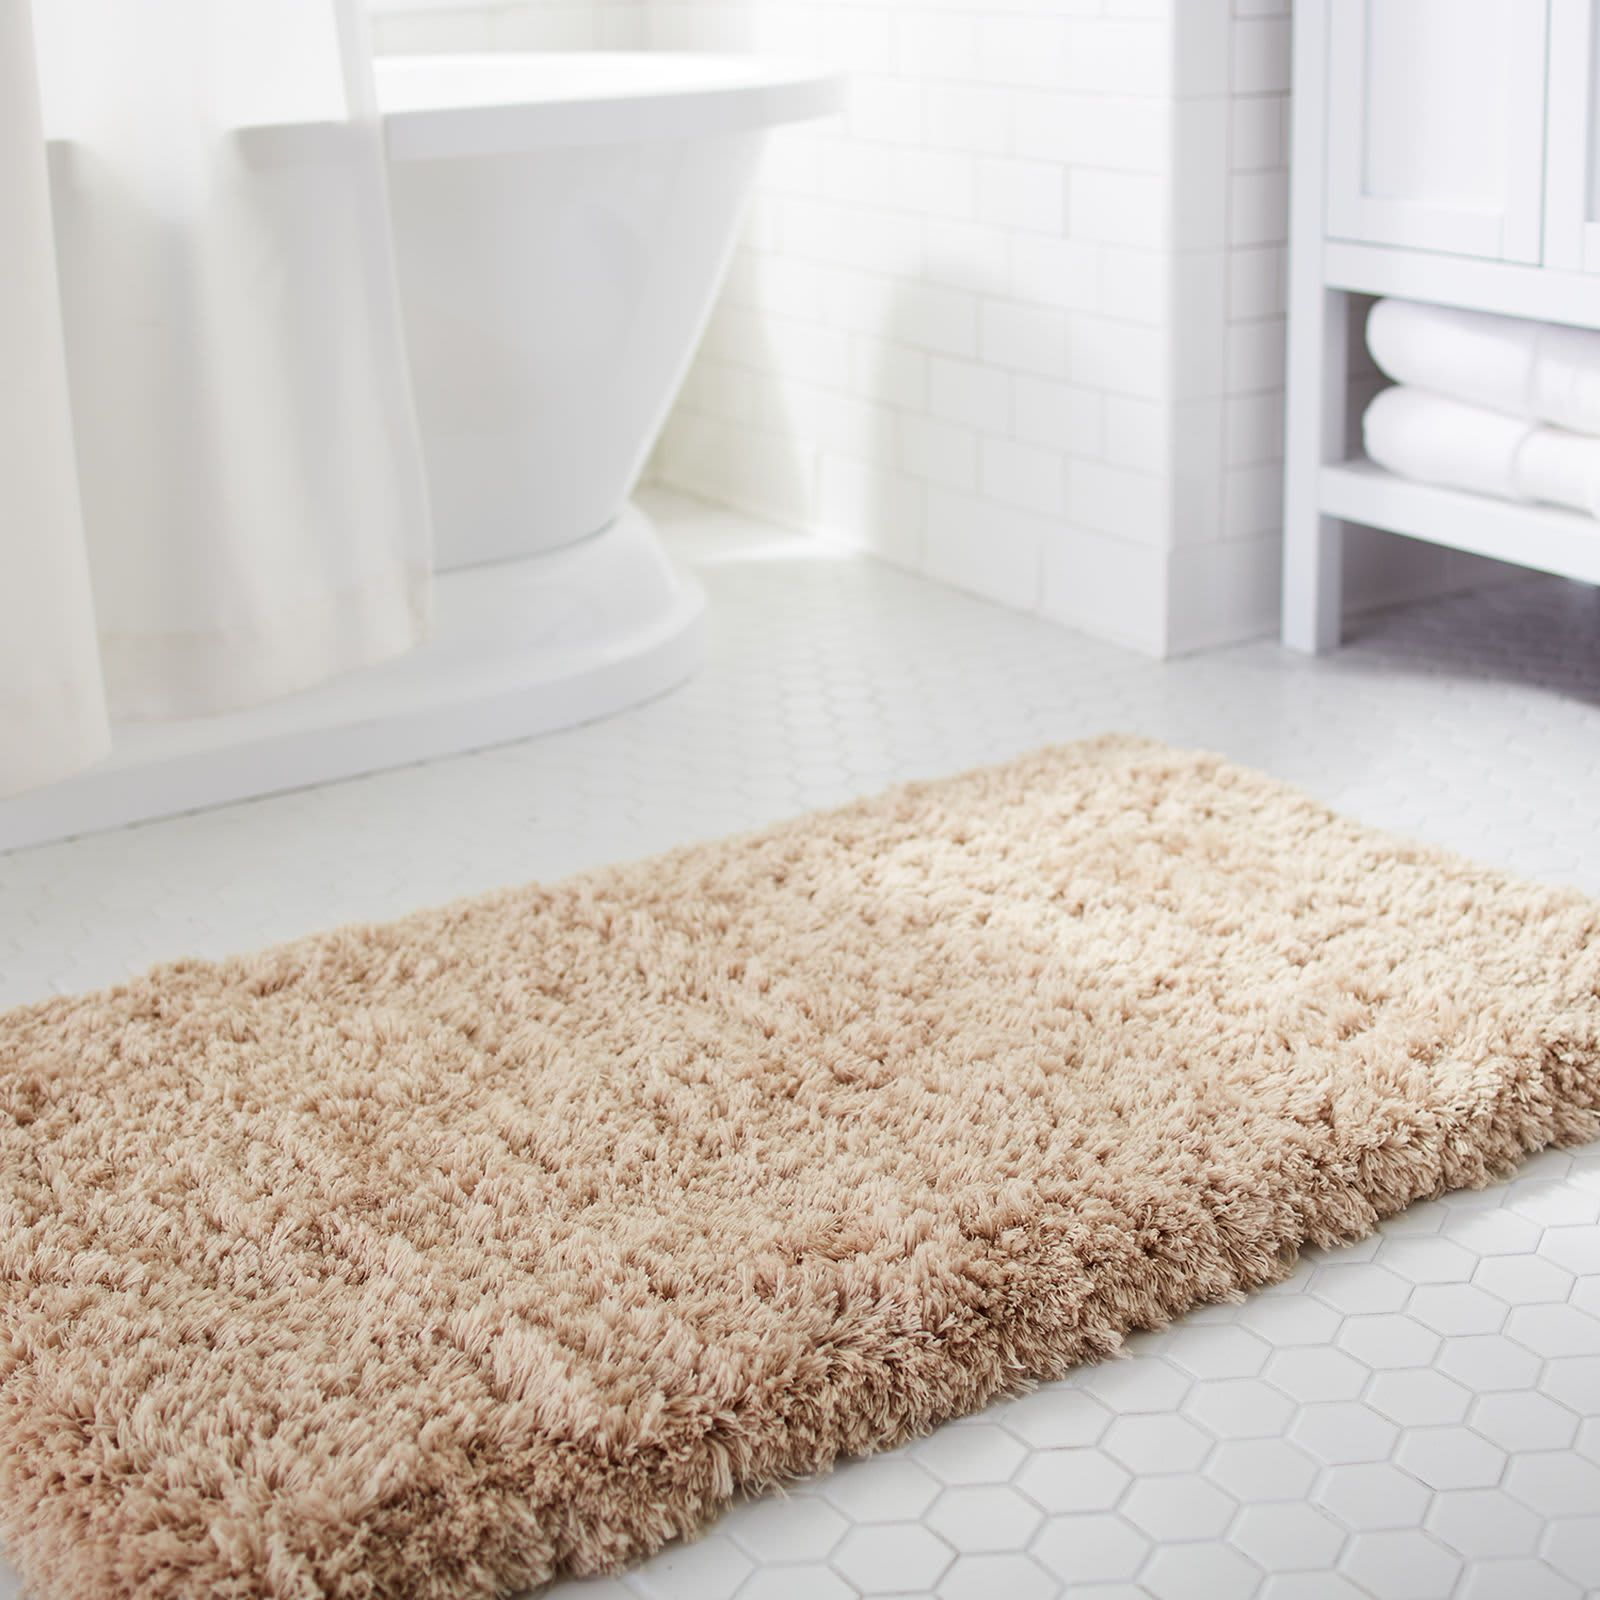 5 Stylish Ways To Warm Up Your Ice Cold Bathroom In No Time Bath Rug 24x60 Bath Rug Indoor Patio Furniture